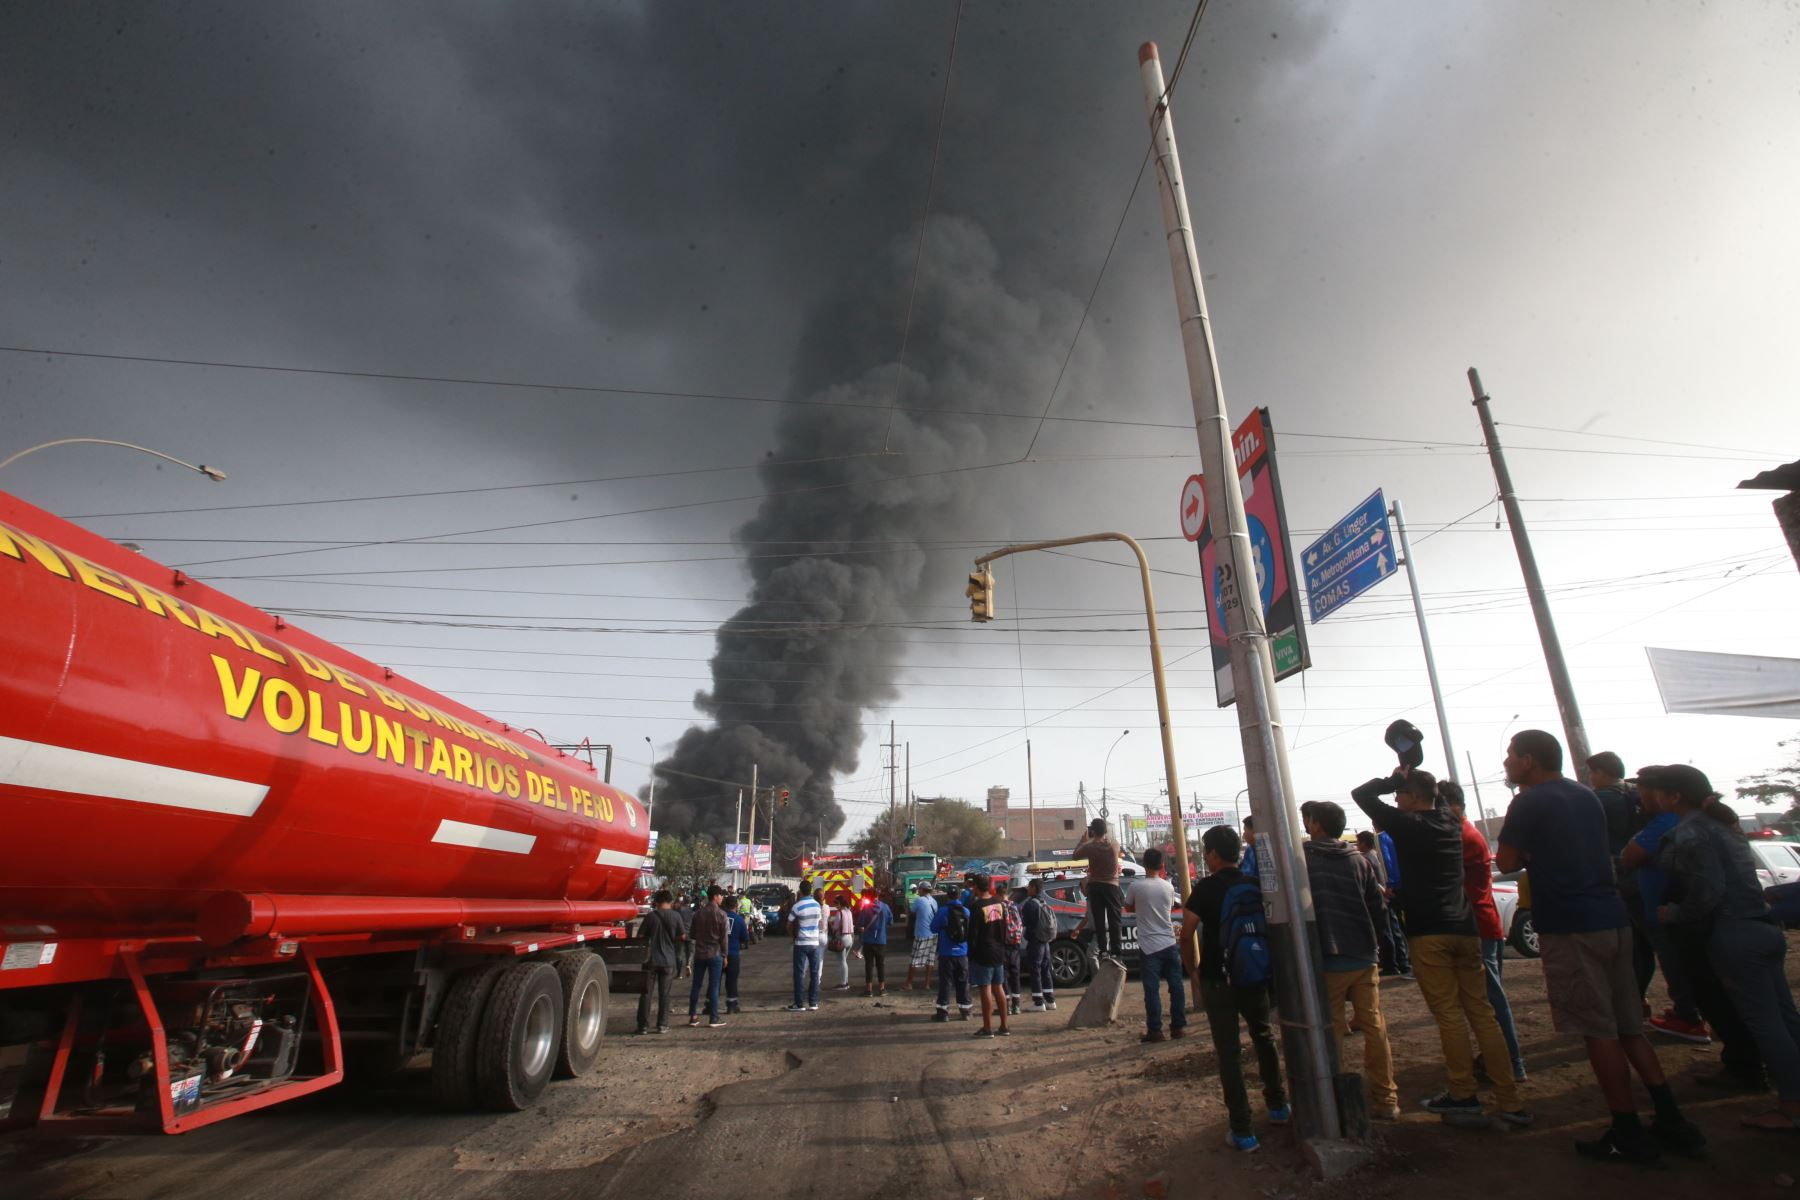 Vizcarra se vistió de bombero e inspeccionó la zona — Incendio en Comas